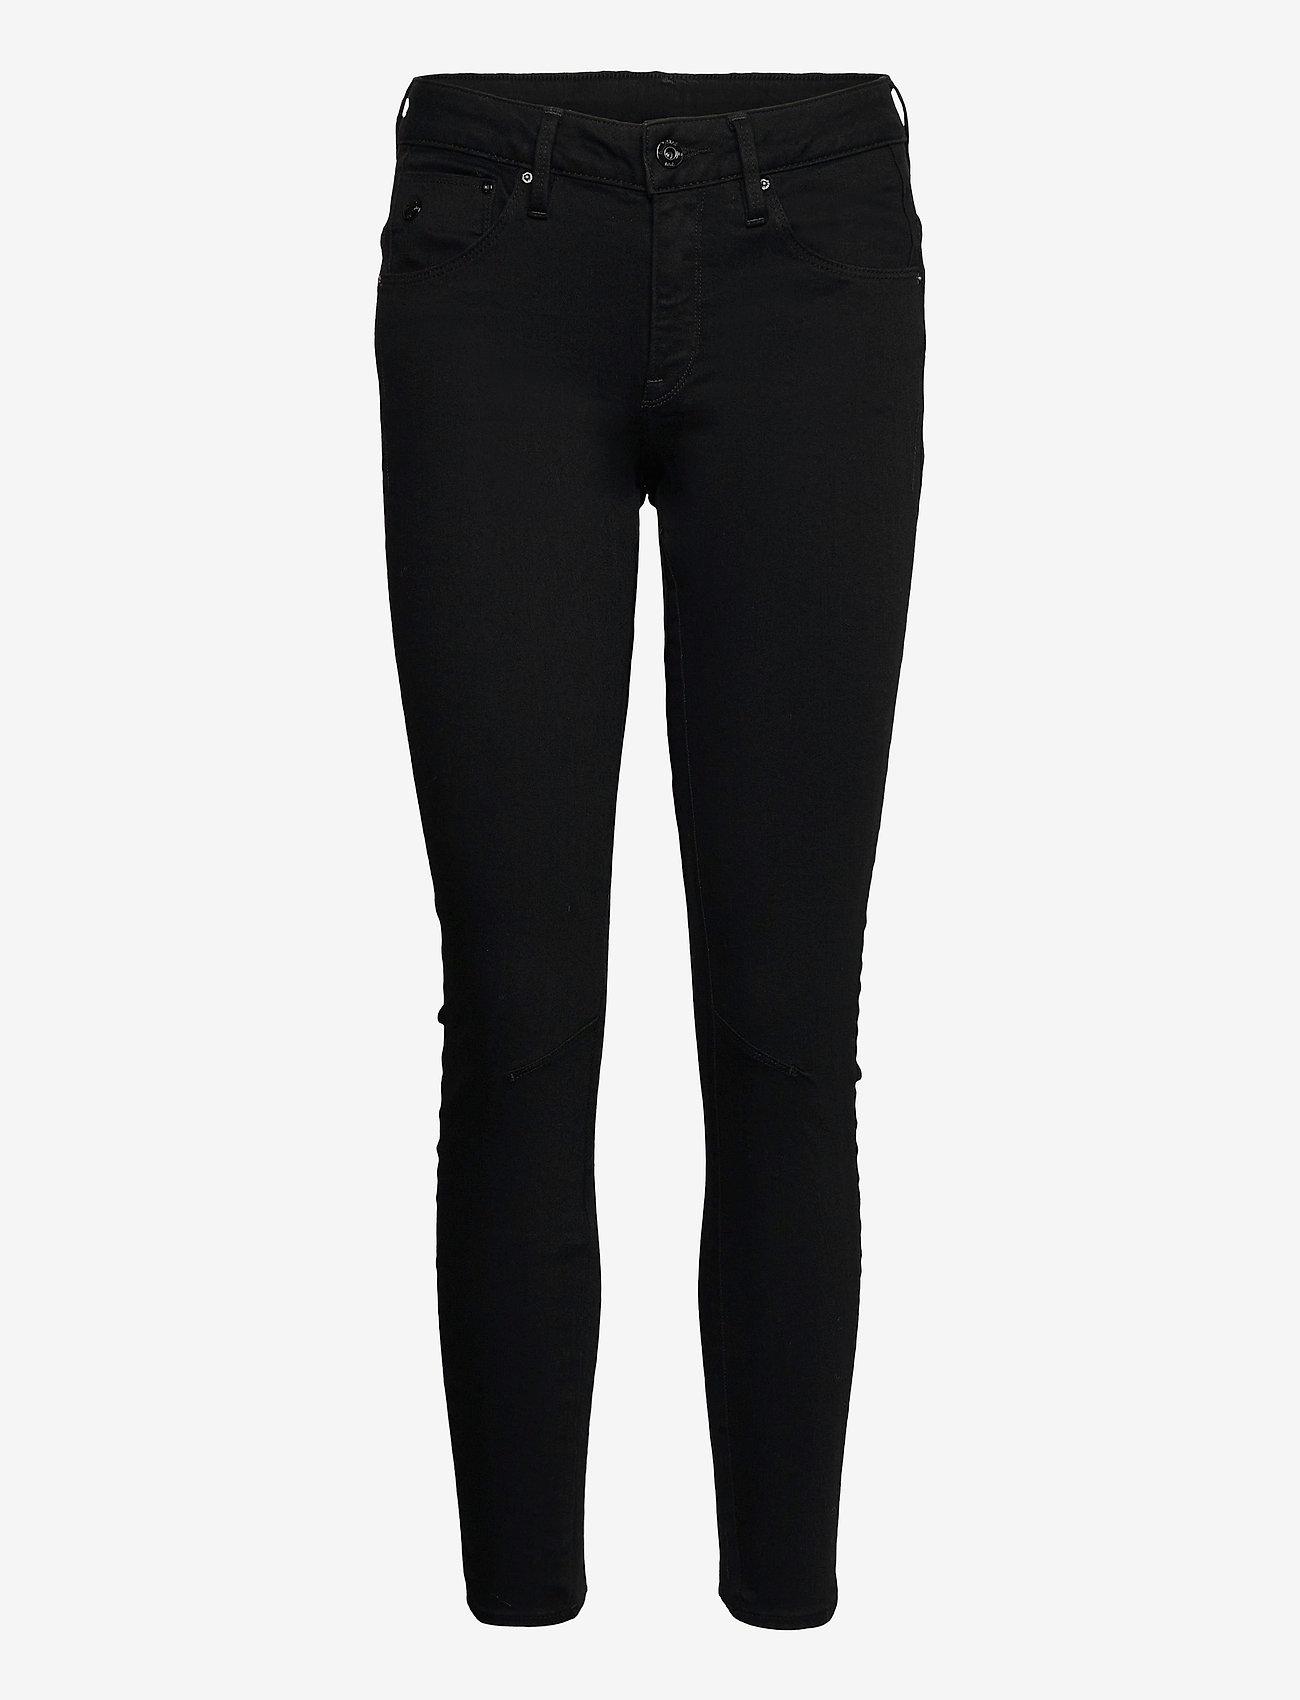 G-star RAW - Arc 3D Mid Skinny Wmn - skinny jeans - pitch black - 0